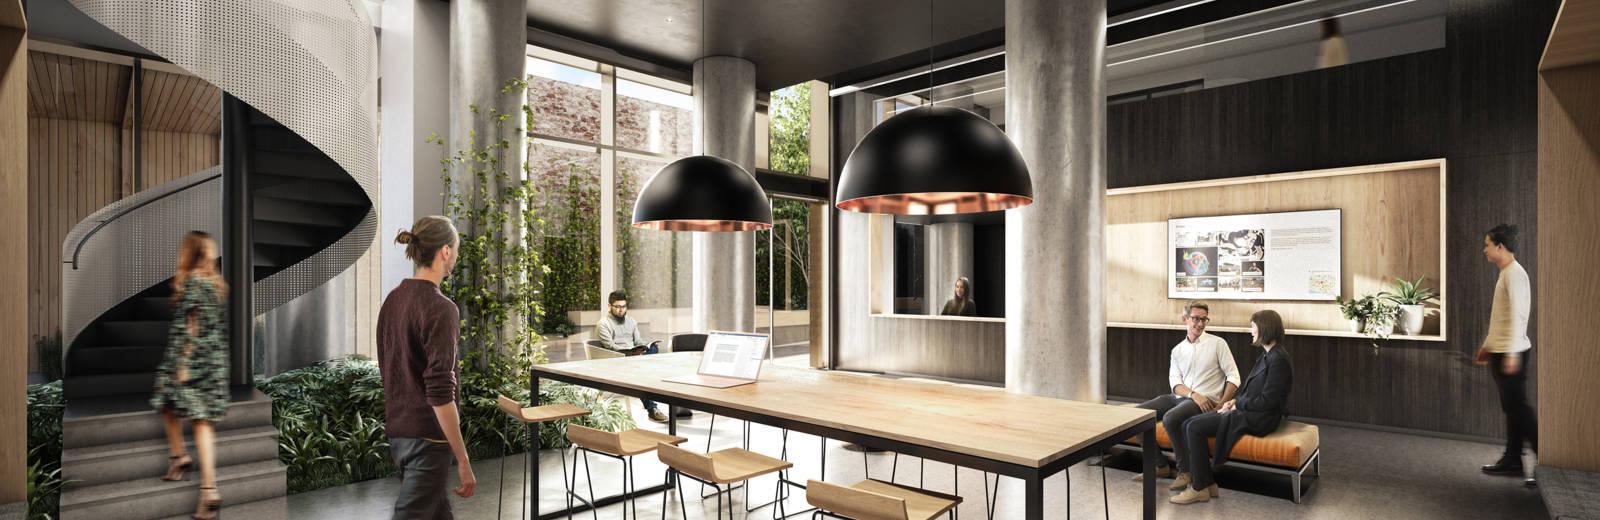 atira la trobe street melbourne student com. Black Bedroom Furniture Sets. Home Design Ideas